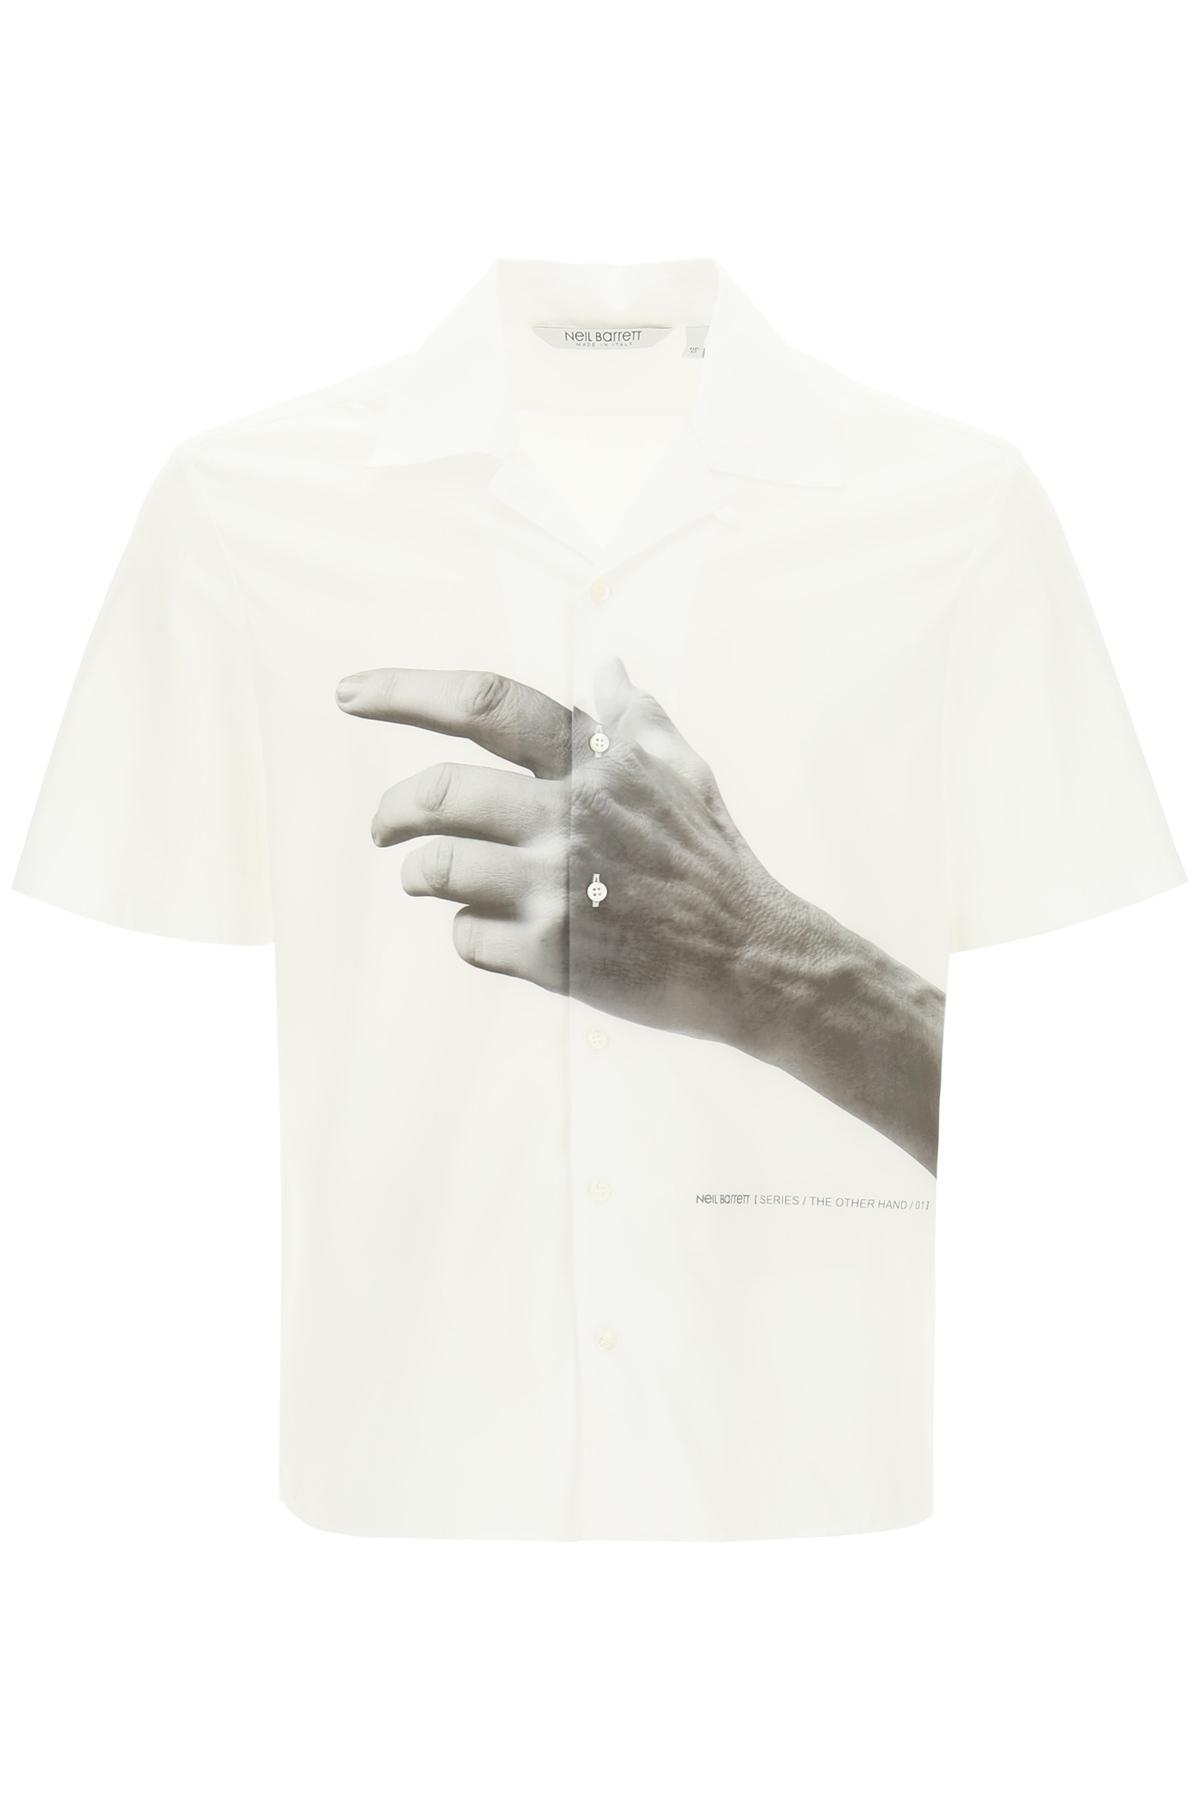 NEIL BARRETT THE OTHER HAND PRINT SHIRT XL White, Grey Cotton